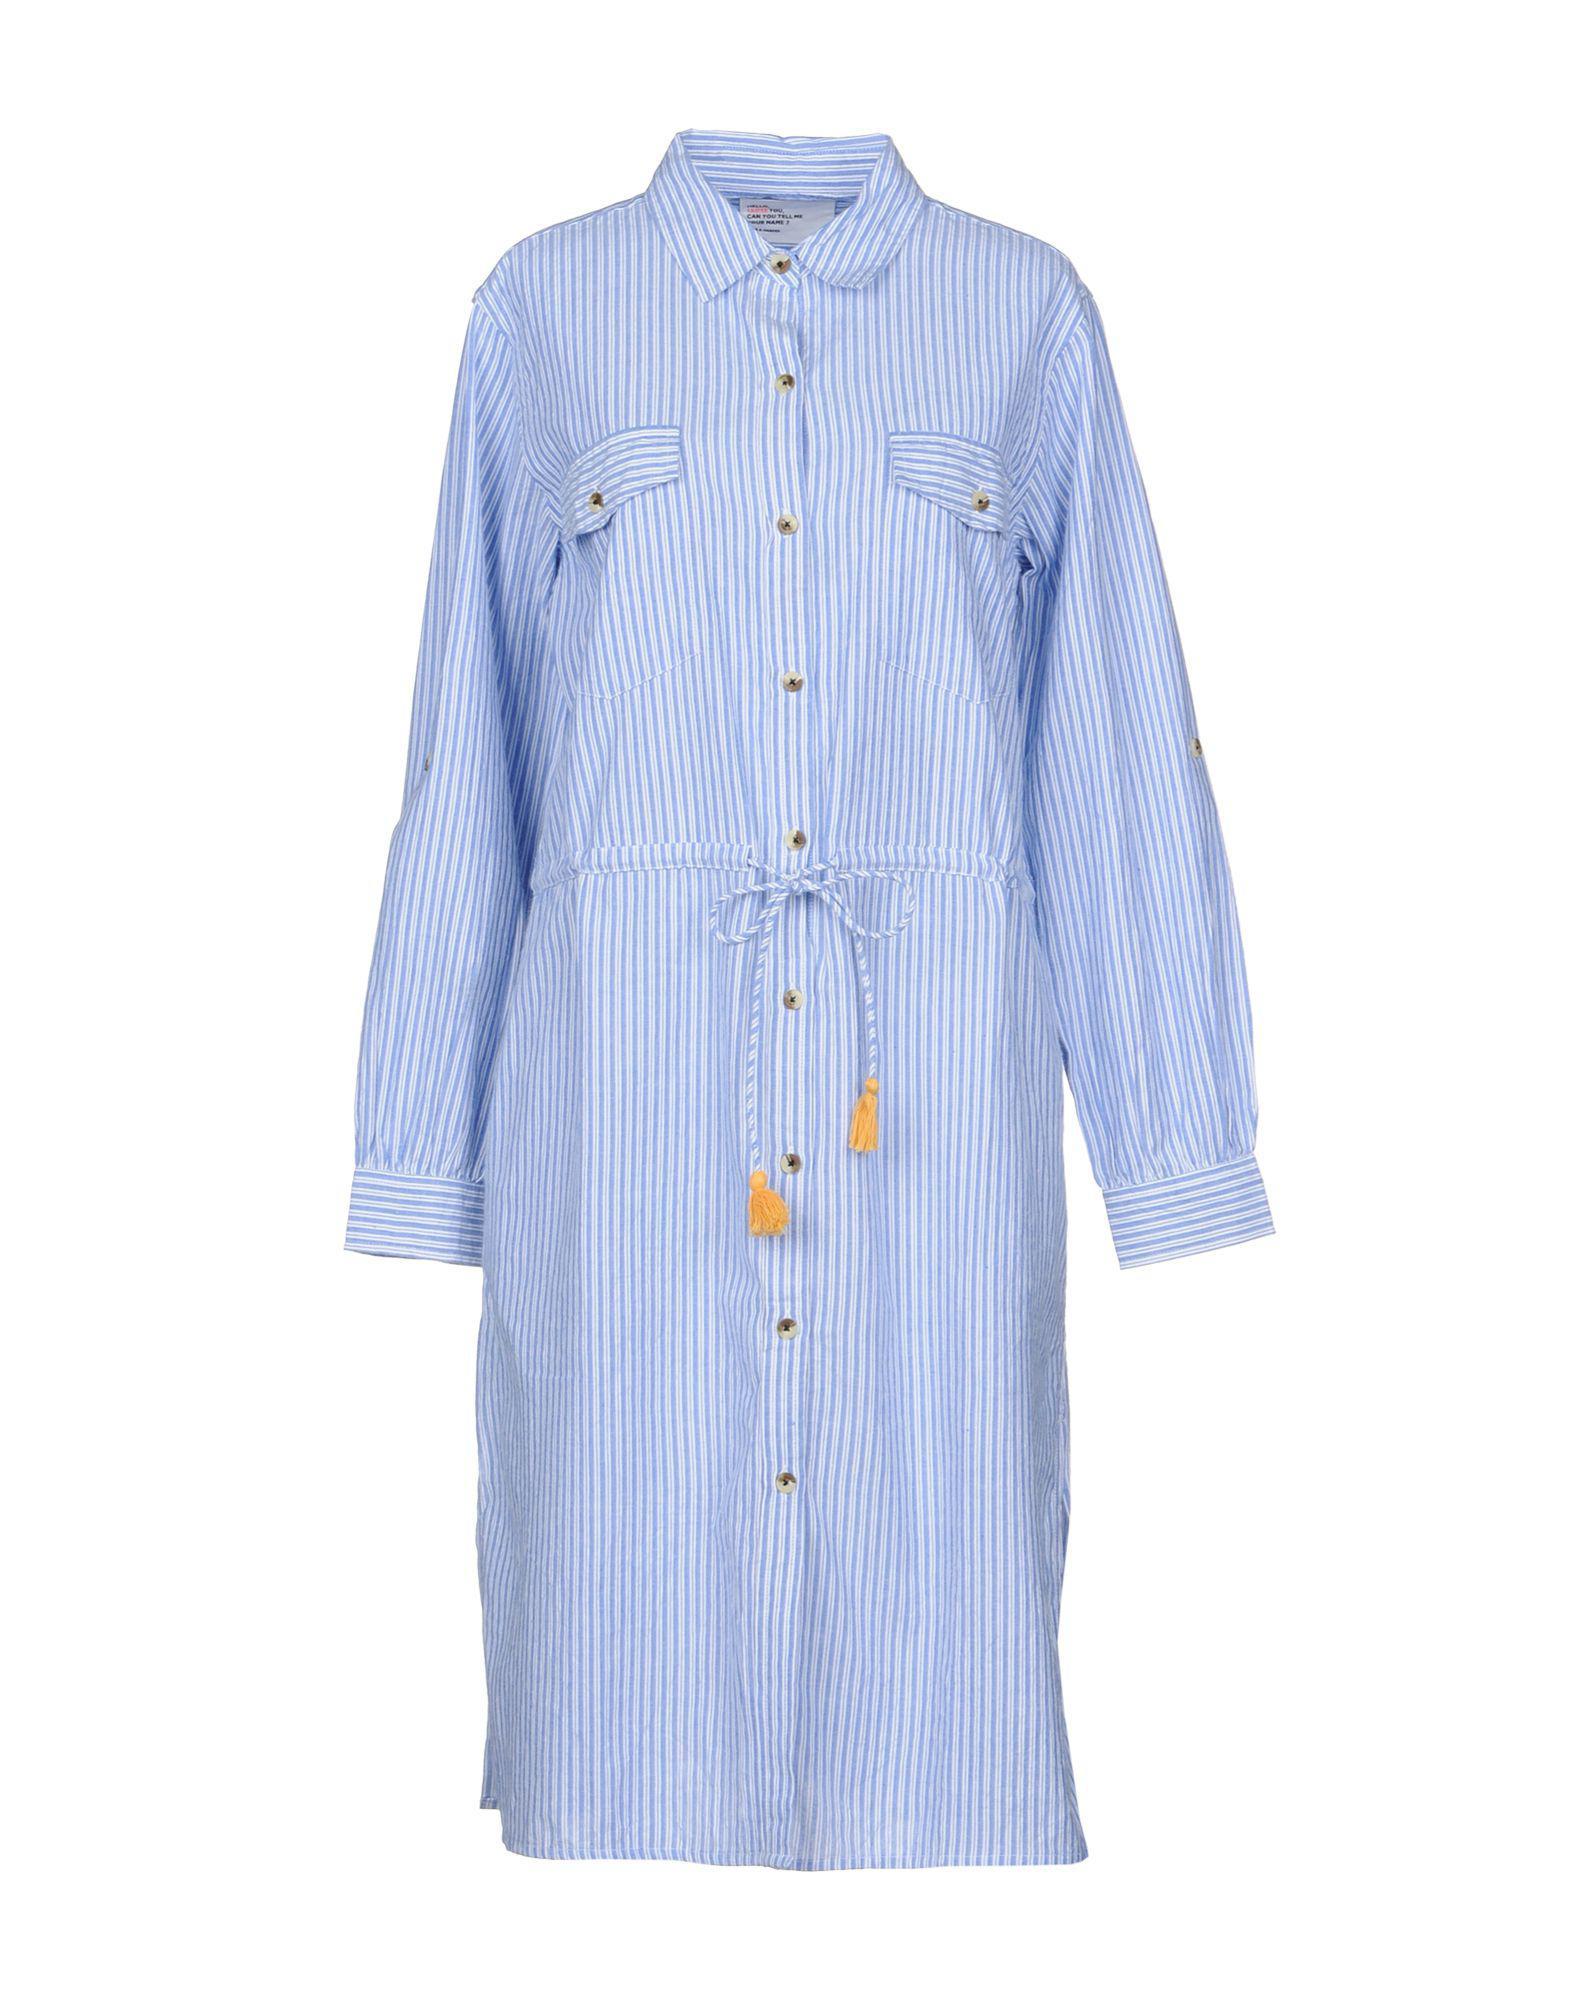 DRESSES - 3/4 length dresses Leon & Harper N3r3YNemMt